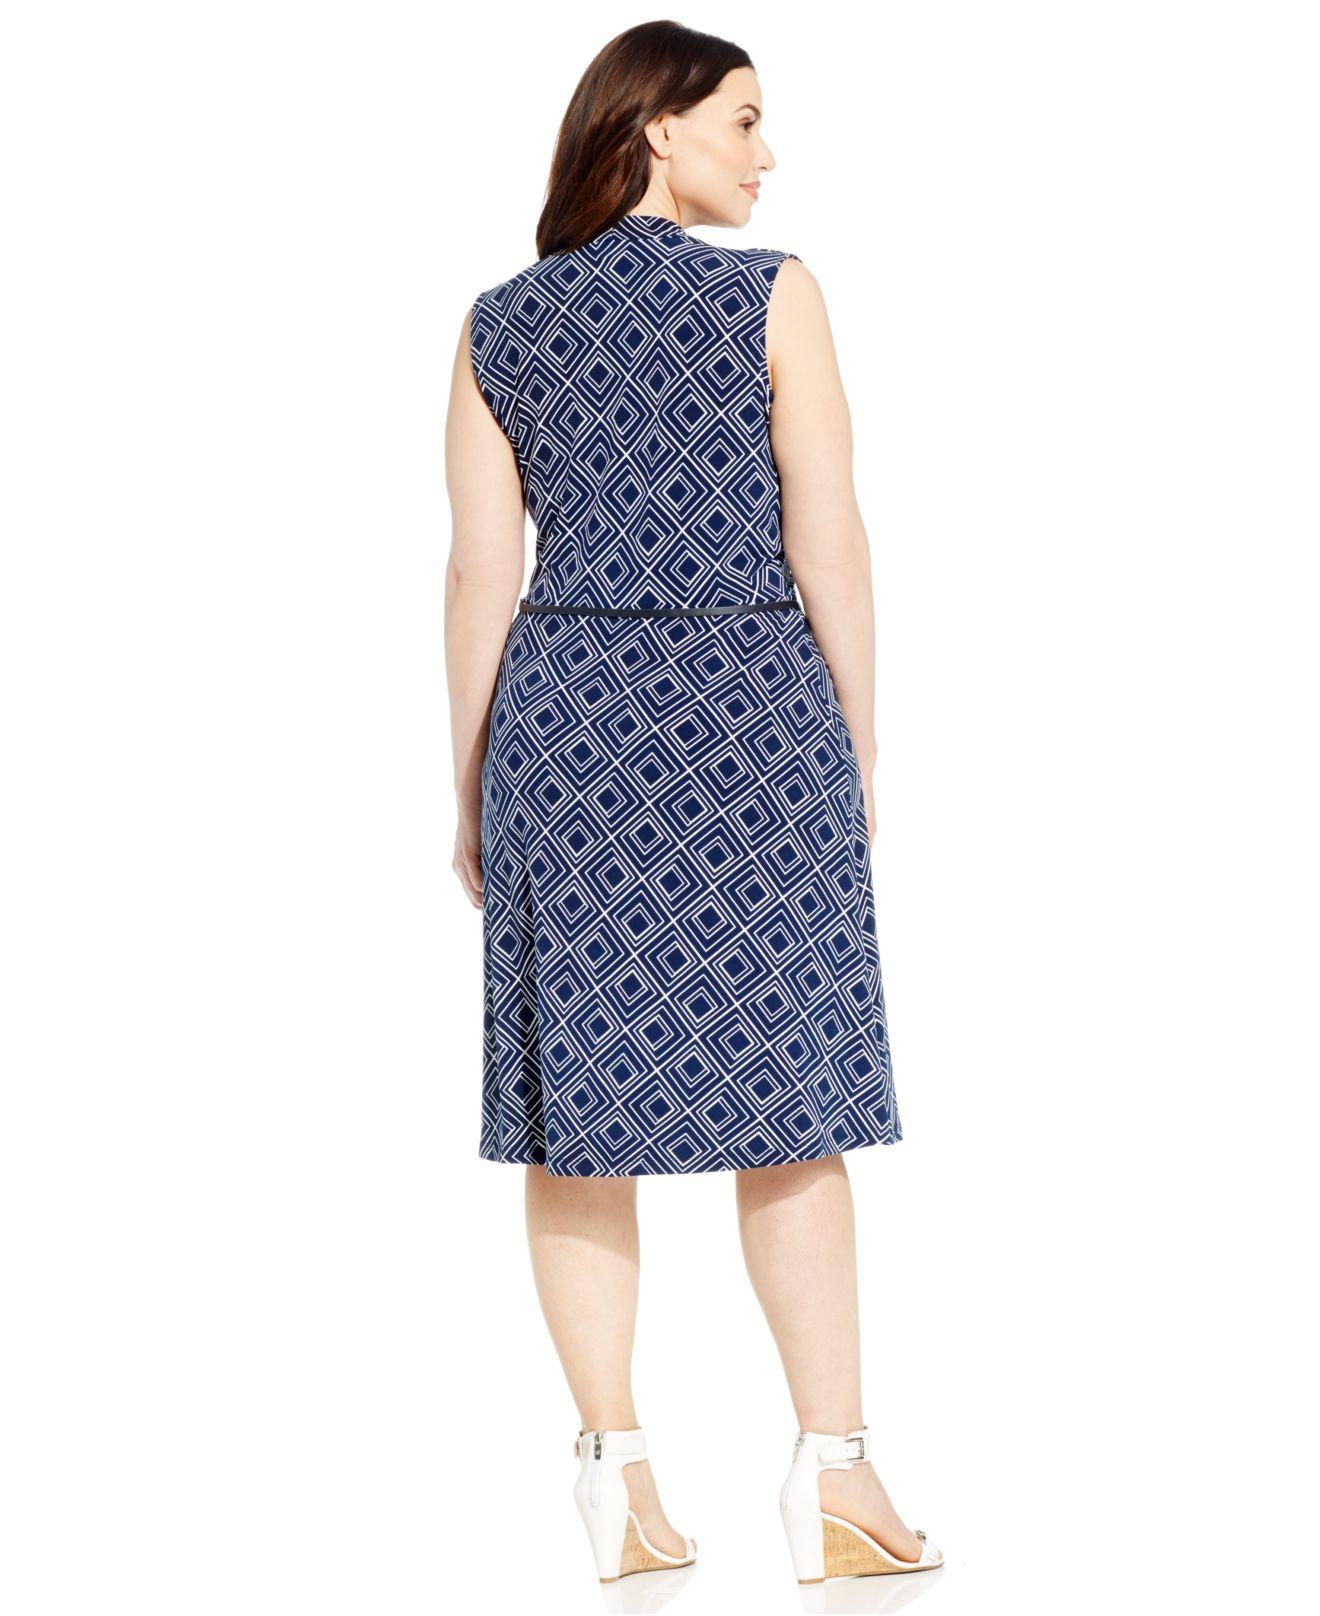 Jones Of New York Plus Size Formal Dresses - Women\'s Dresses